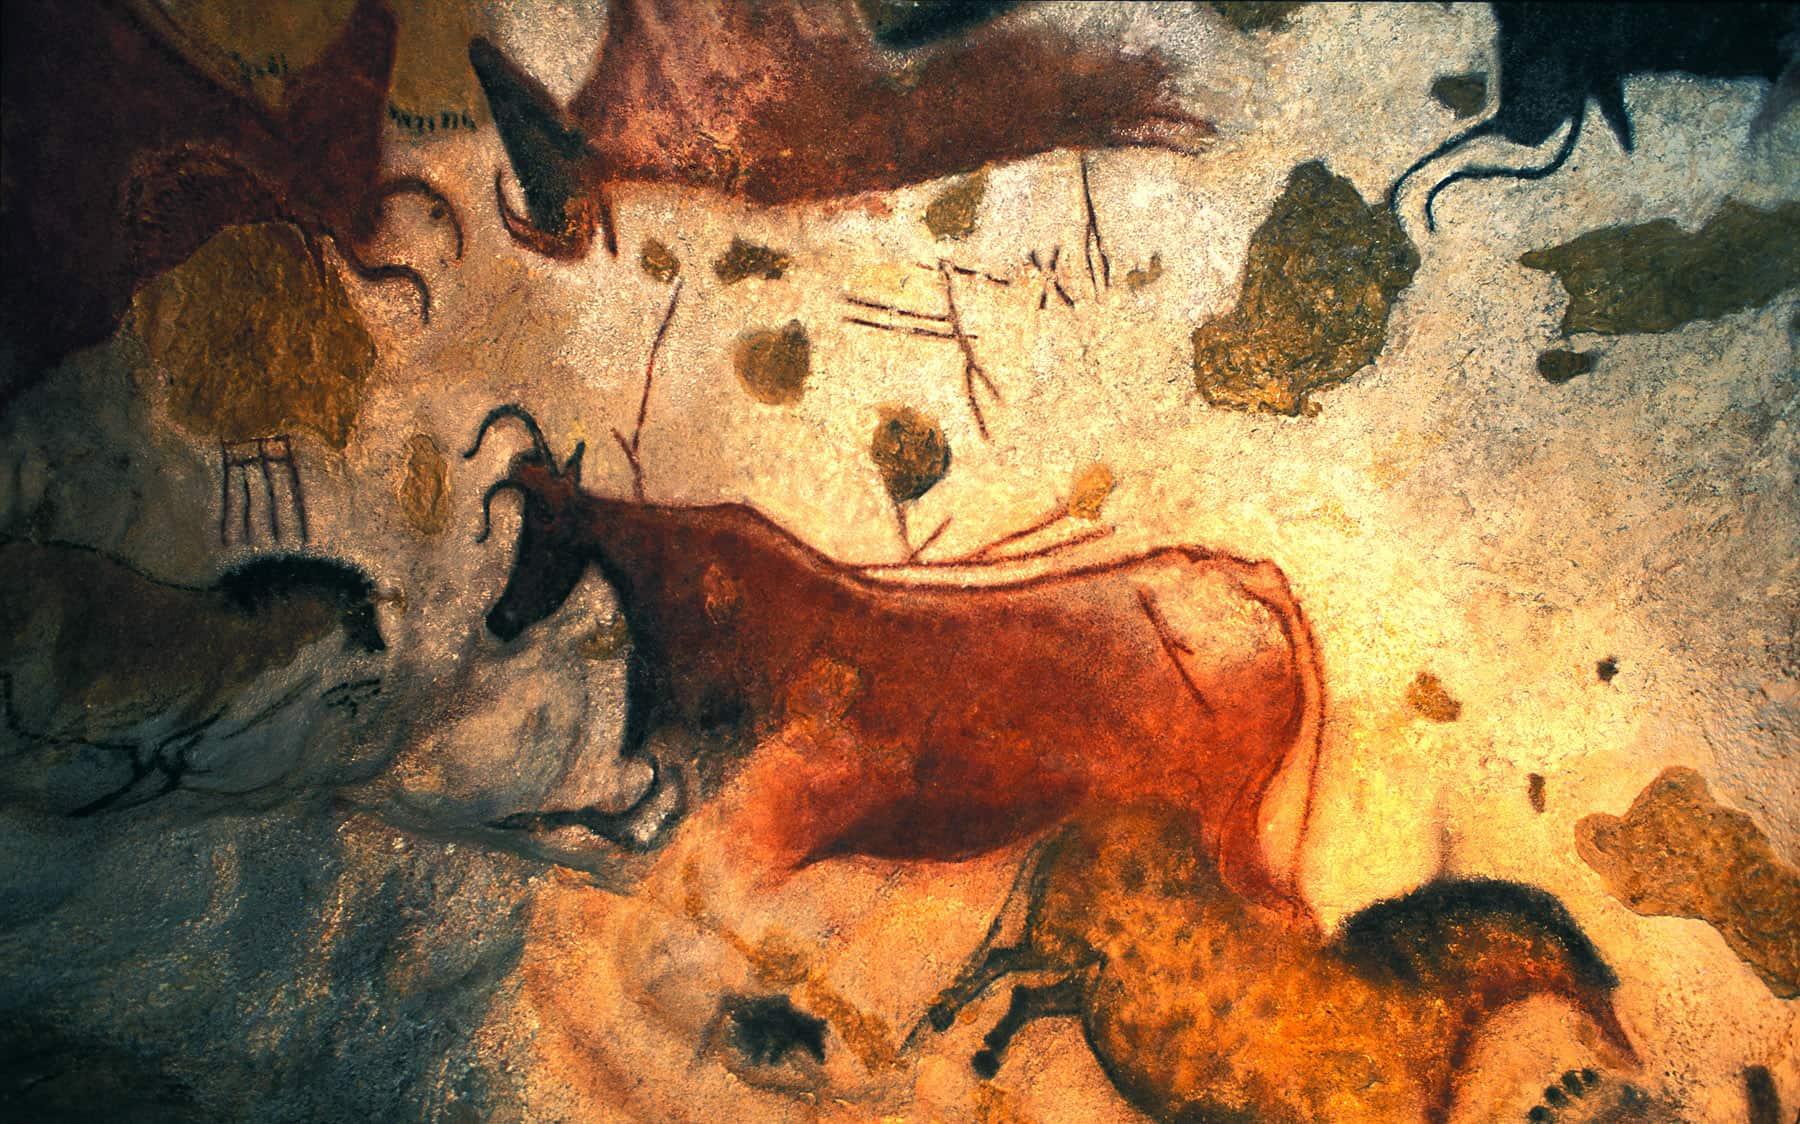 Mağara Resimleri - Lascaux